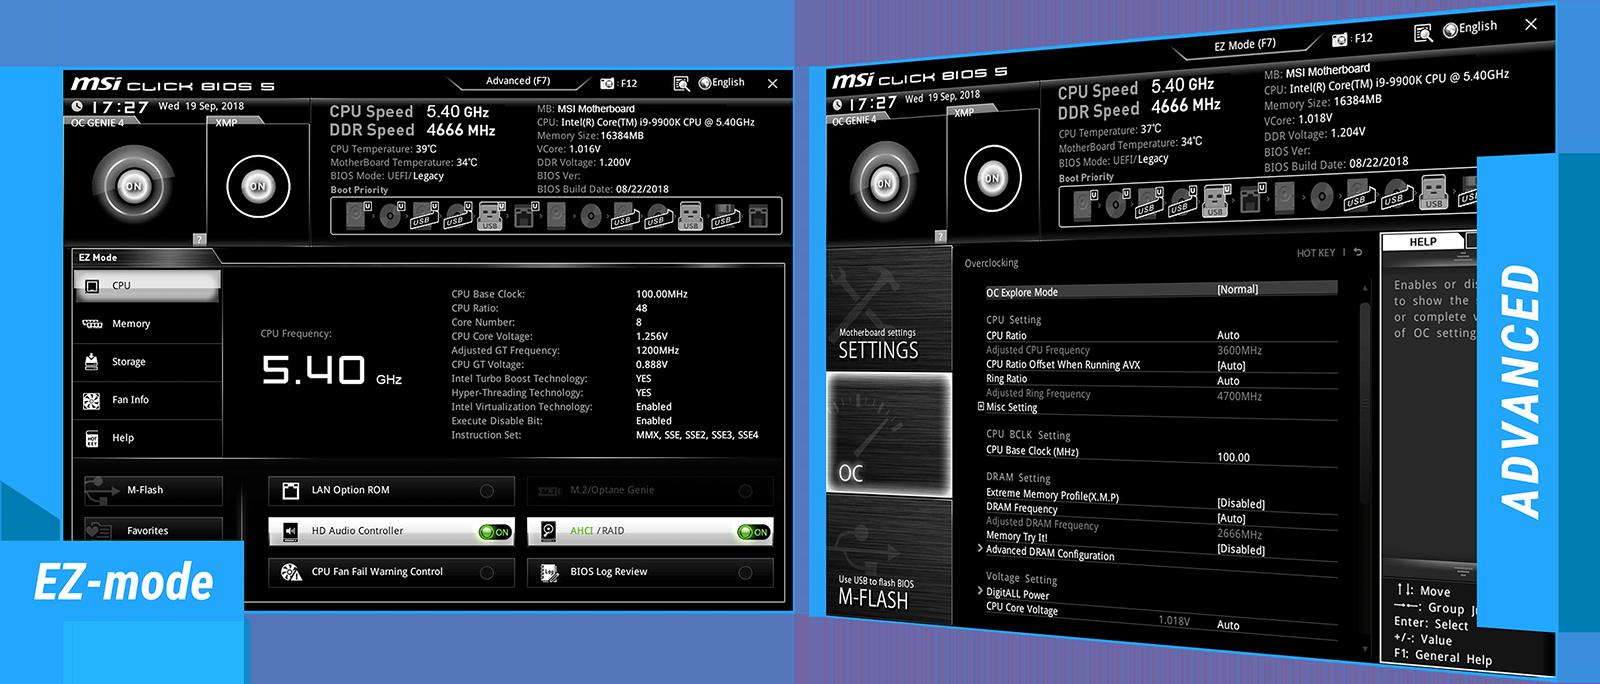 screenshot of EZ-mode and advanced